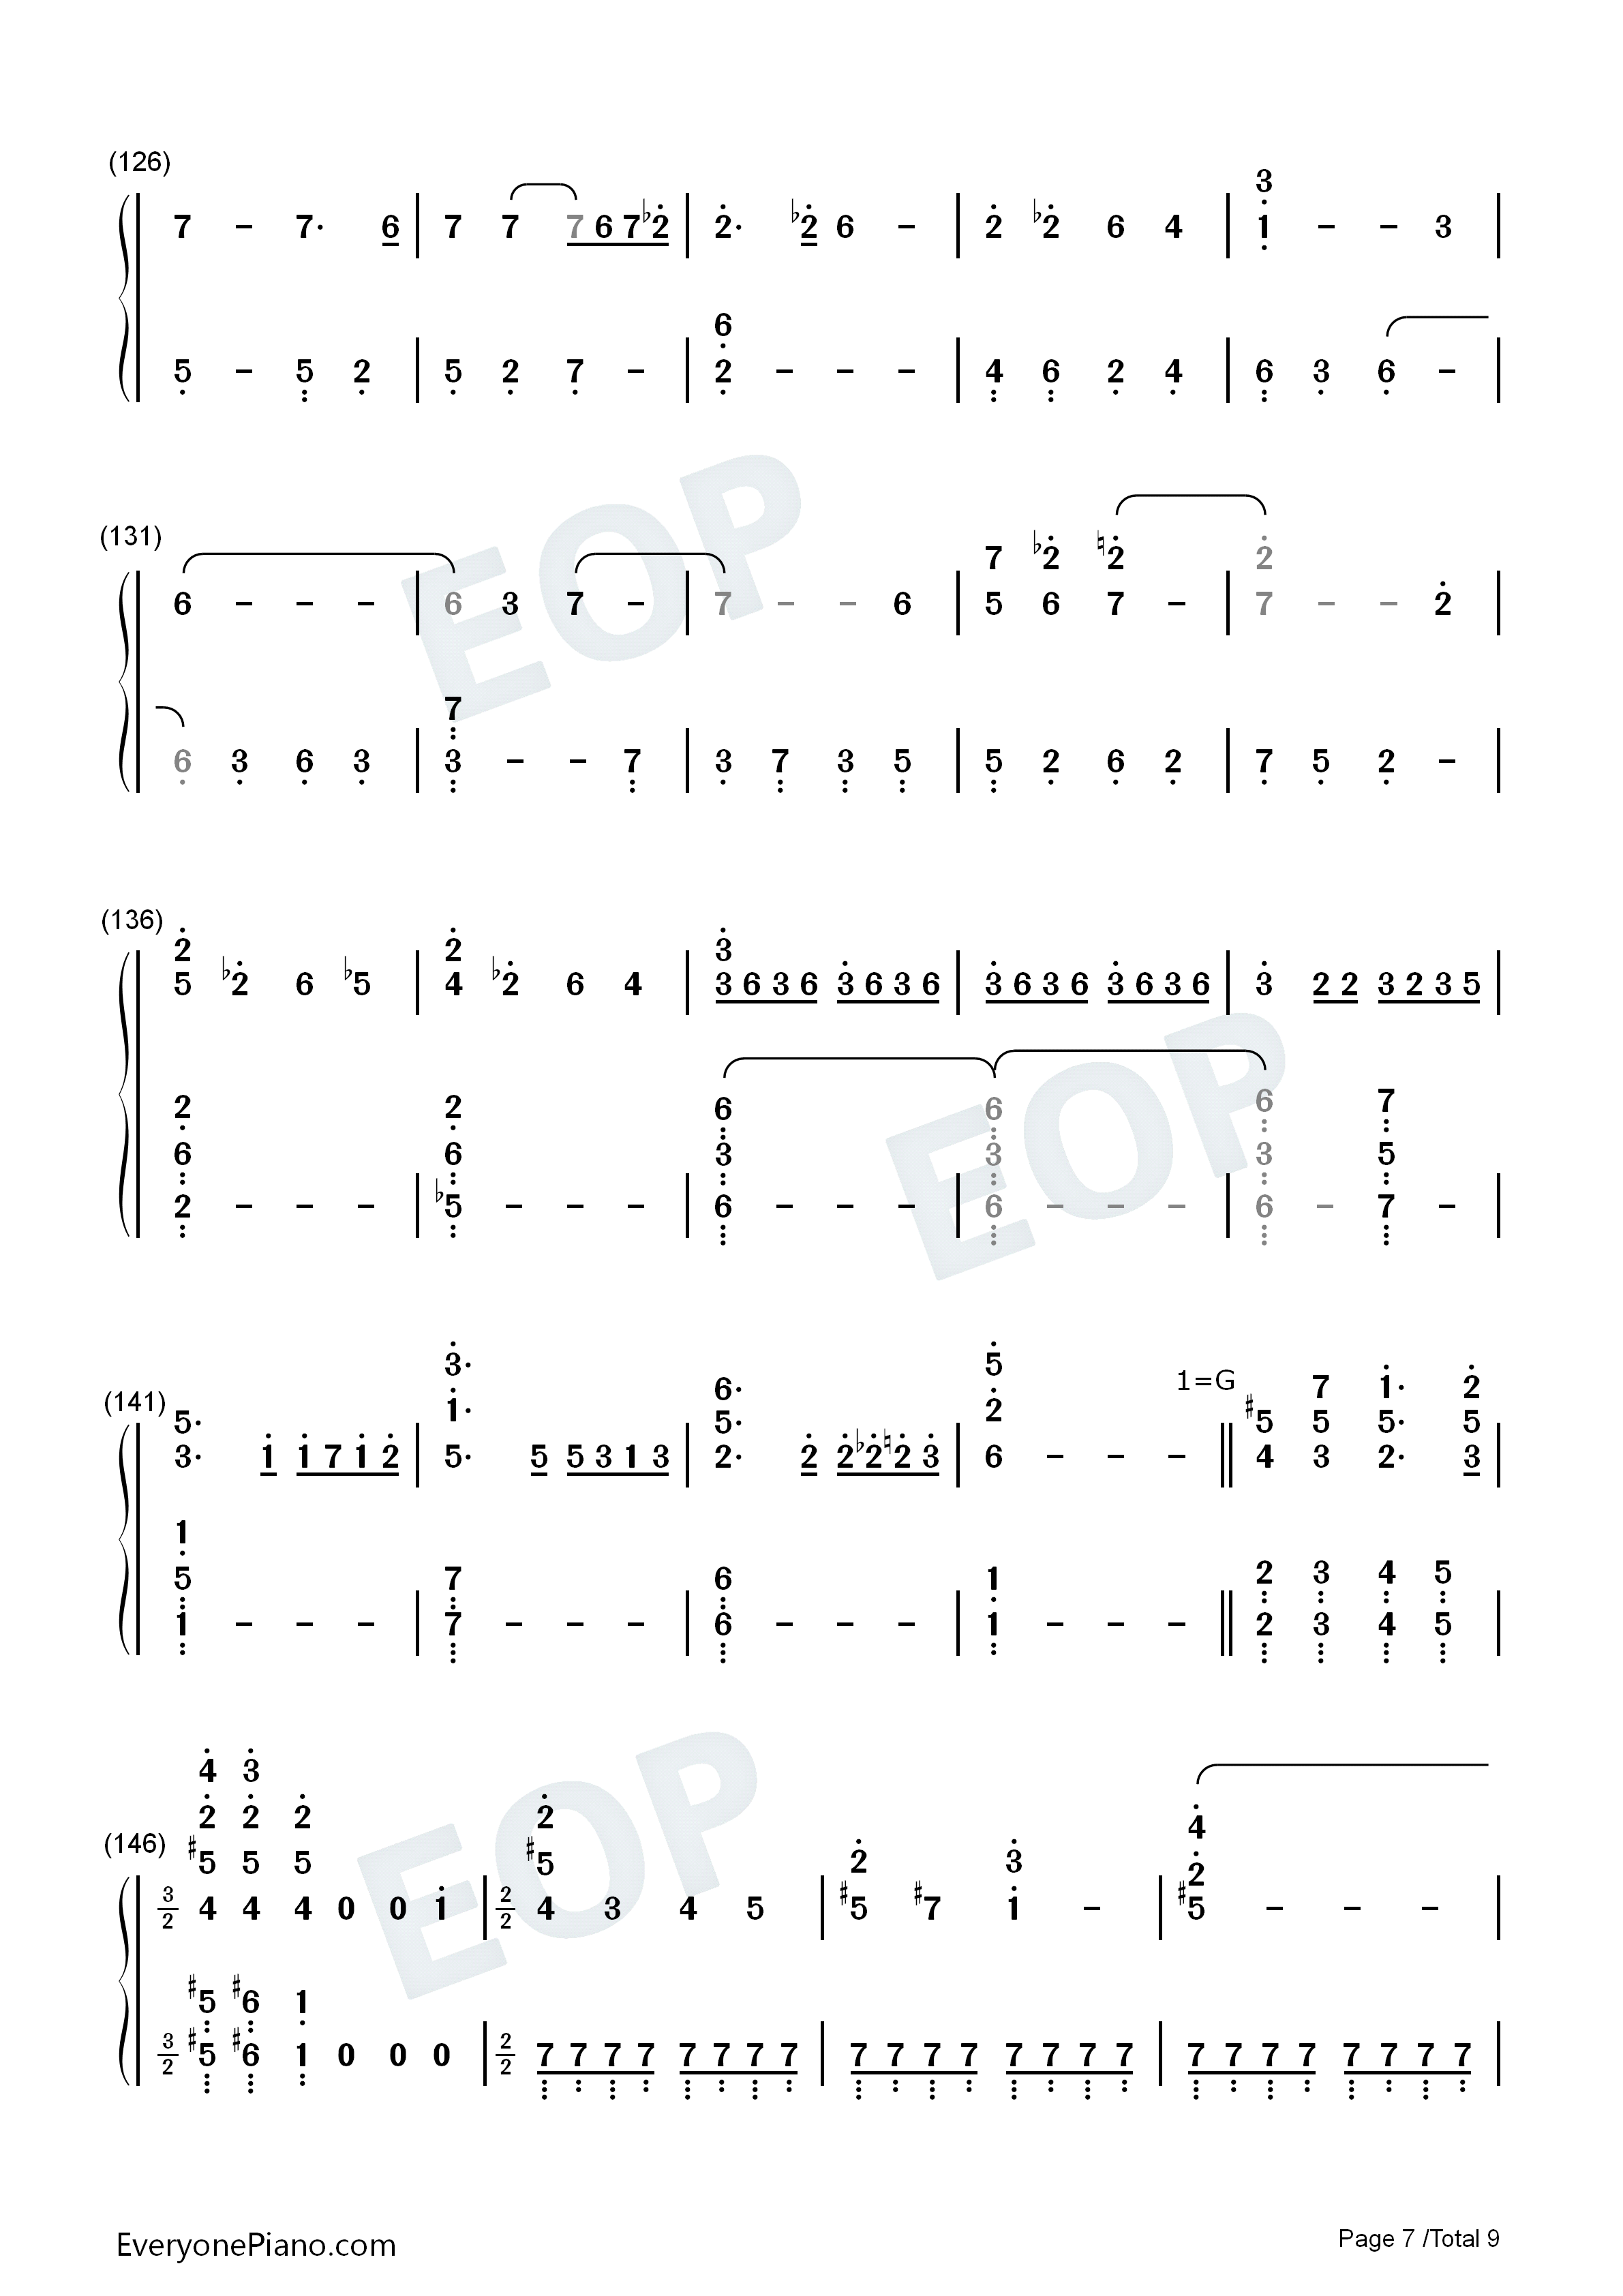 forever-冰雪奇缘插曲双手简谱